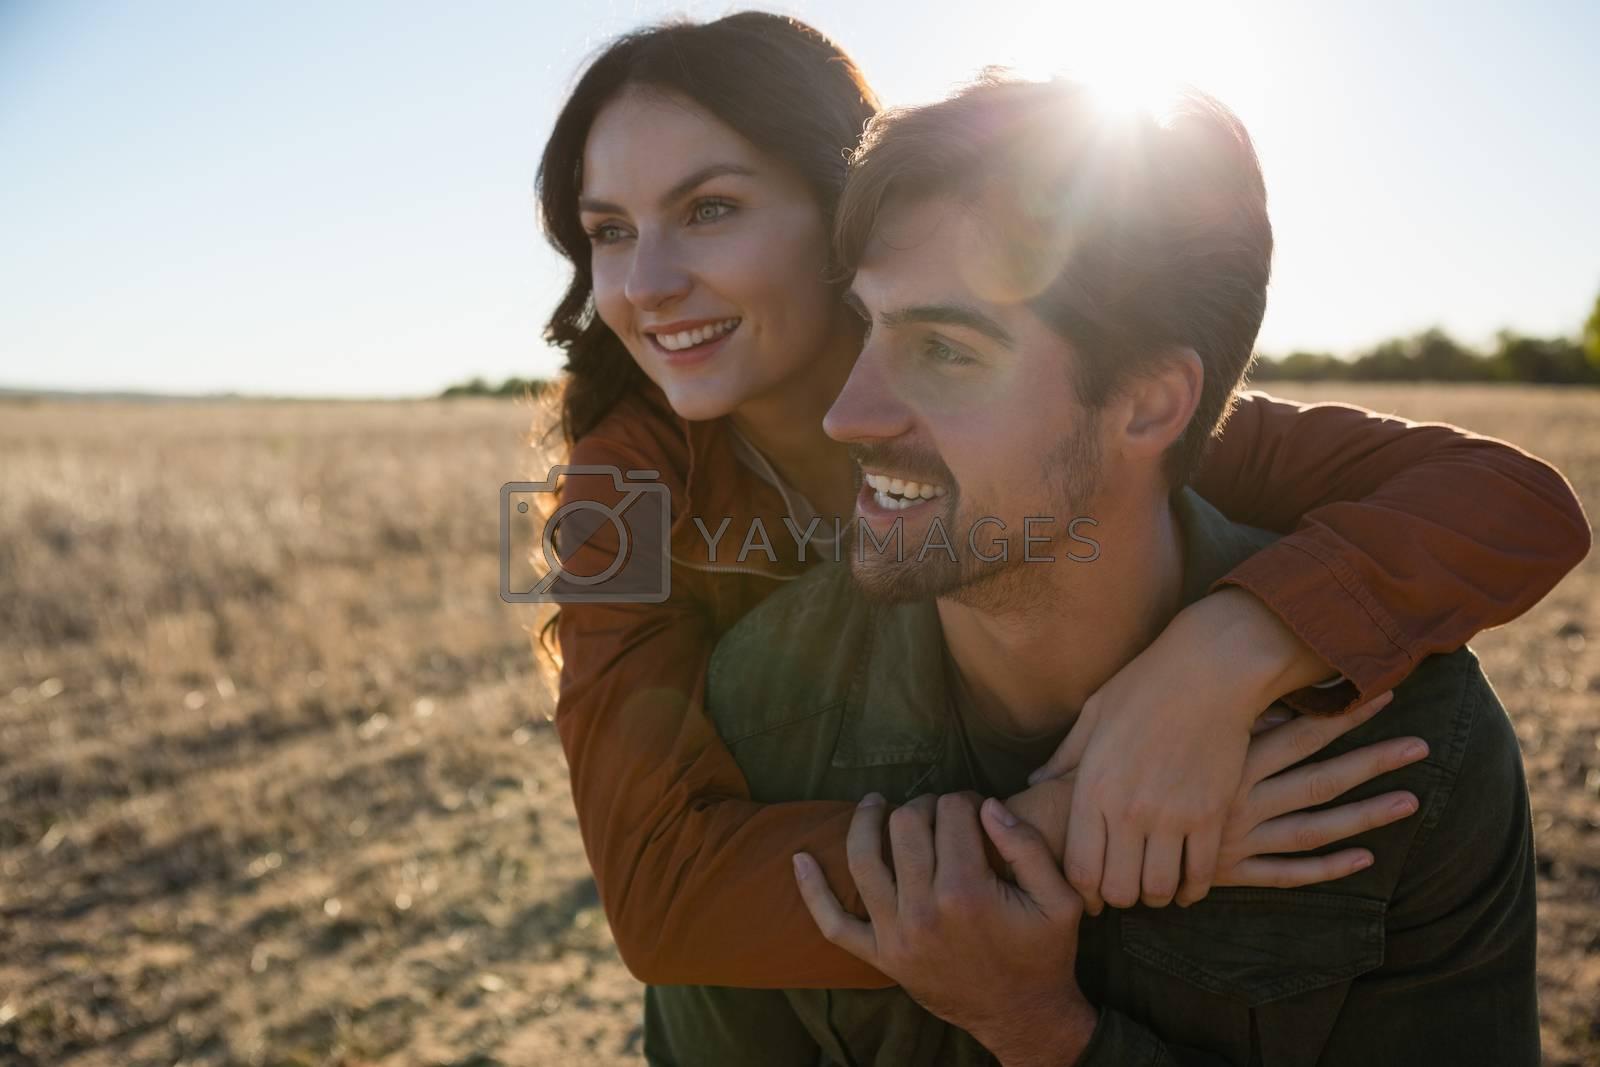 Man giving woman piggyback ride on landscape by Wavebreakmedia